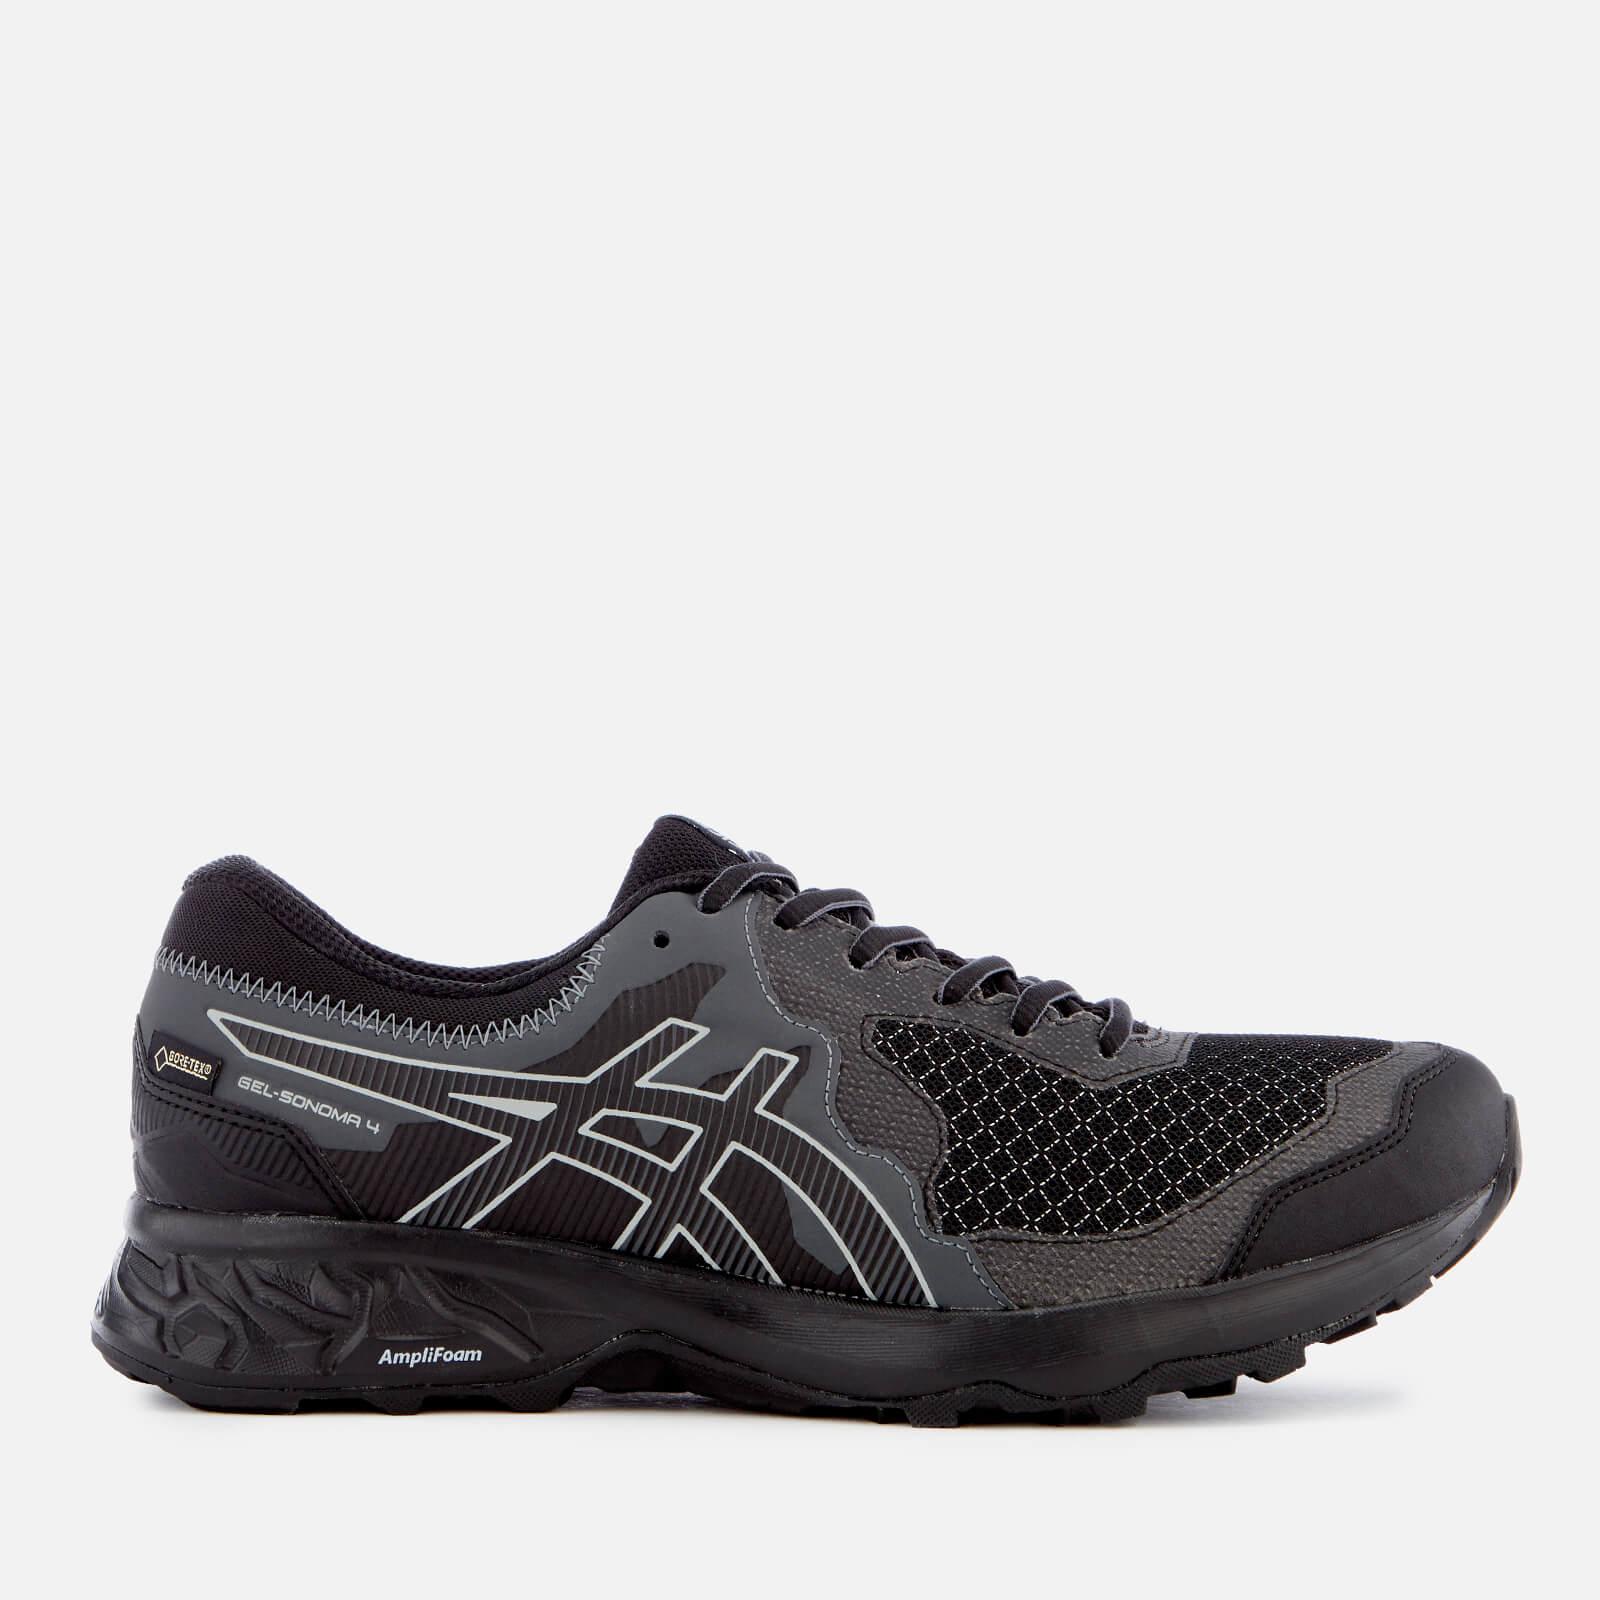 Asics Men's Running Trail Gel Somoma 4 Goretex Trainers - Black/Stone - UK 7.5 - Black